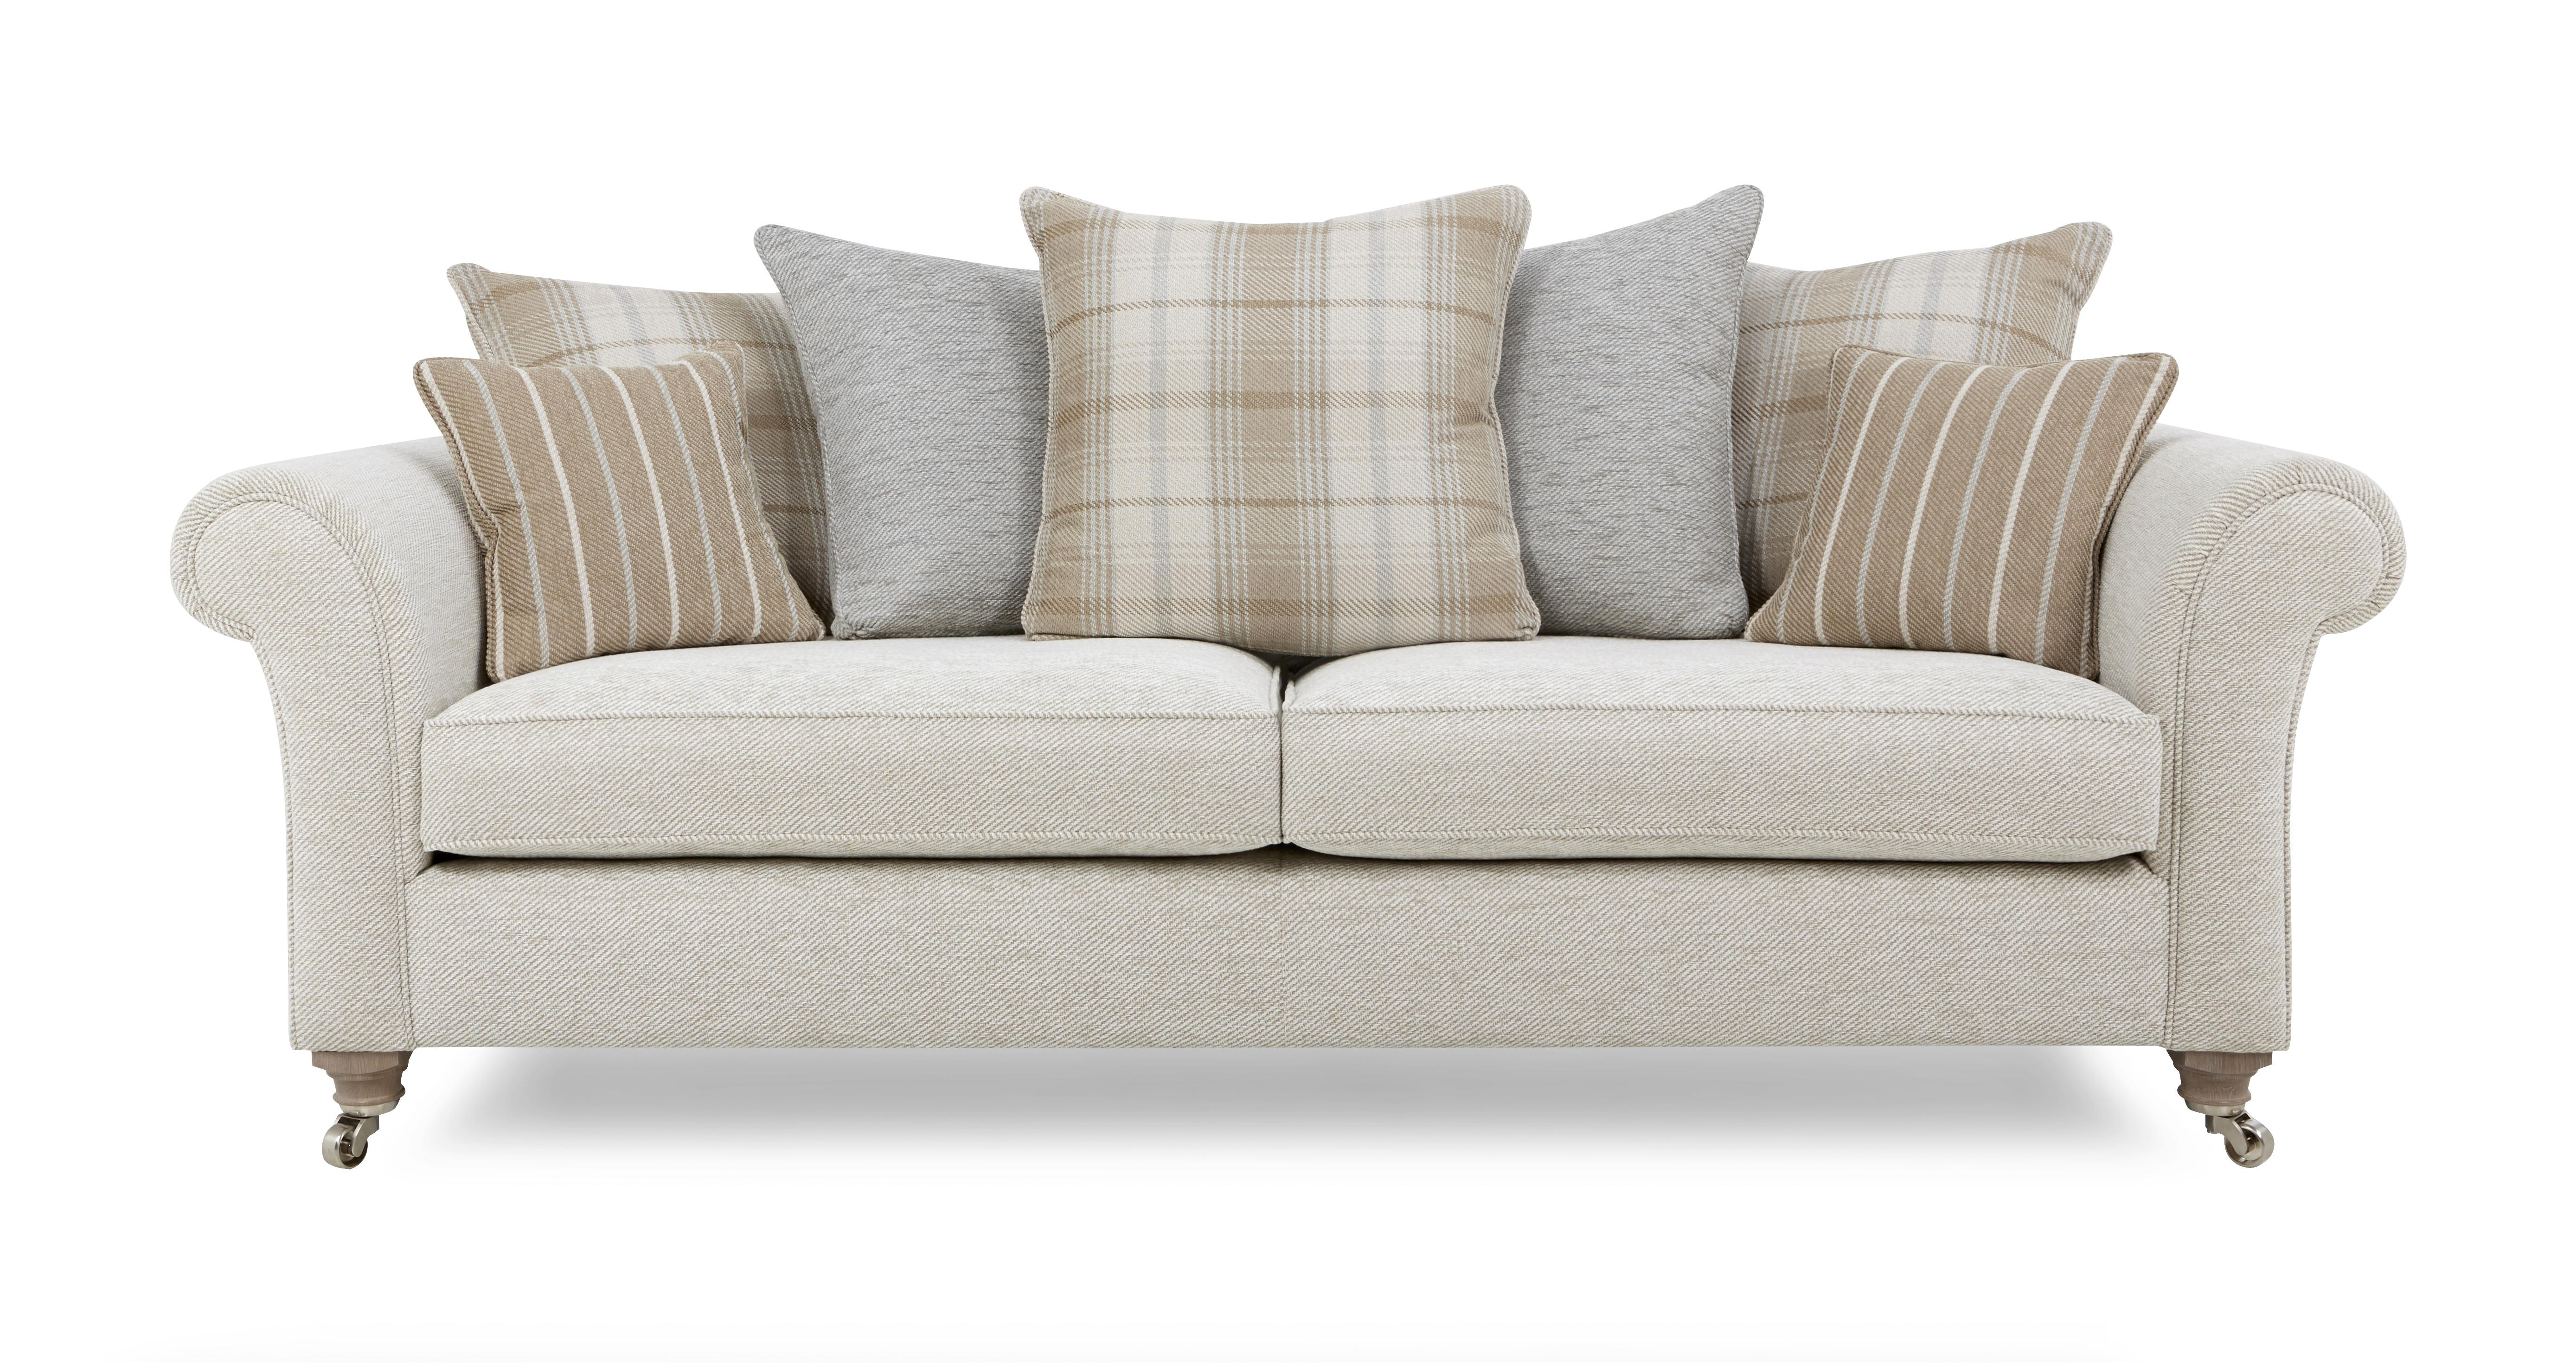 morland plain body  seater pillow back sofa  dfs -   °